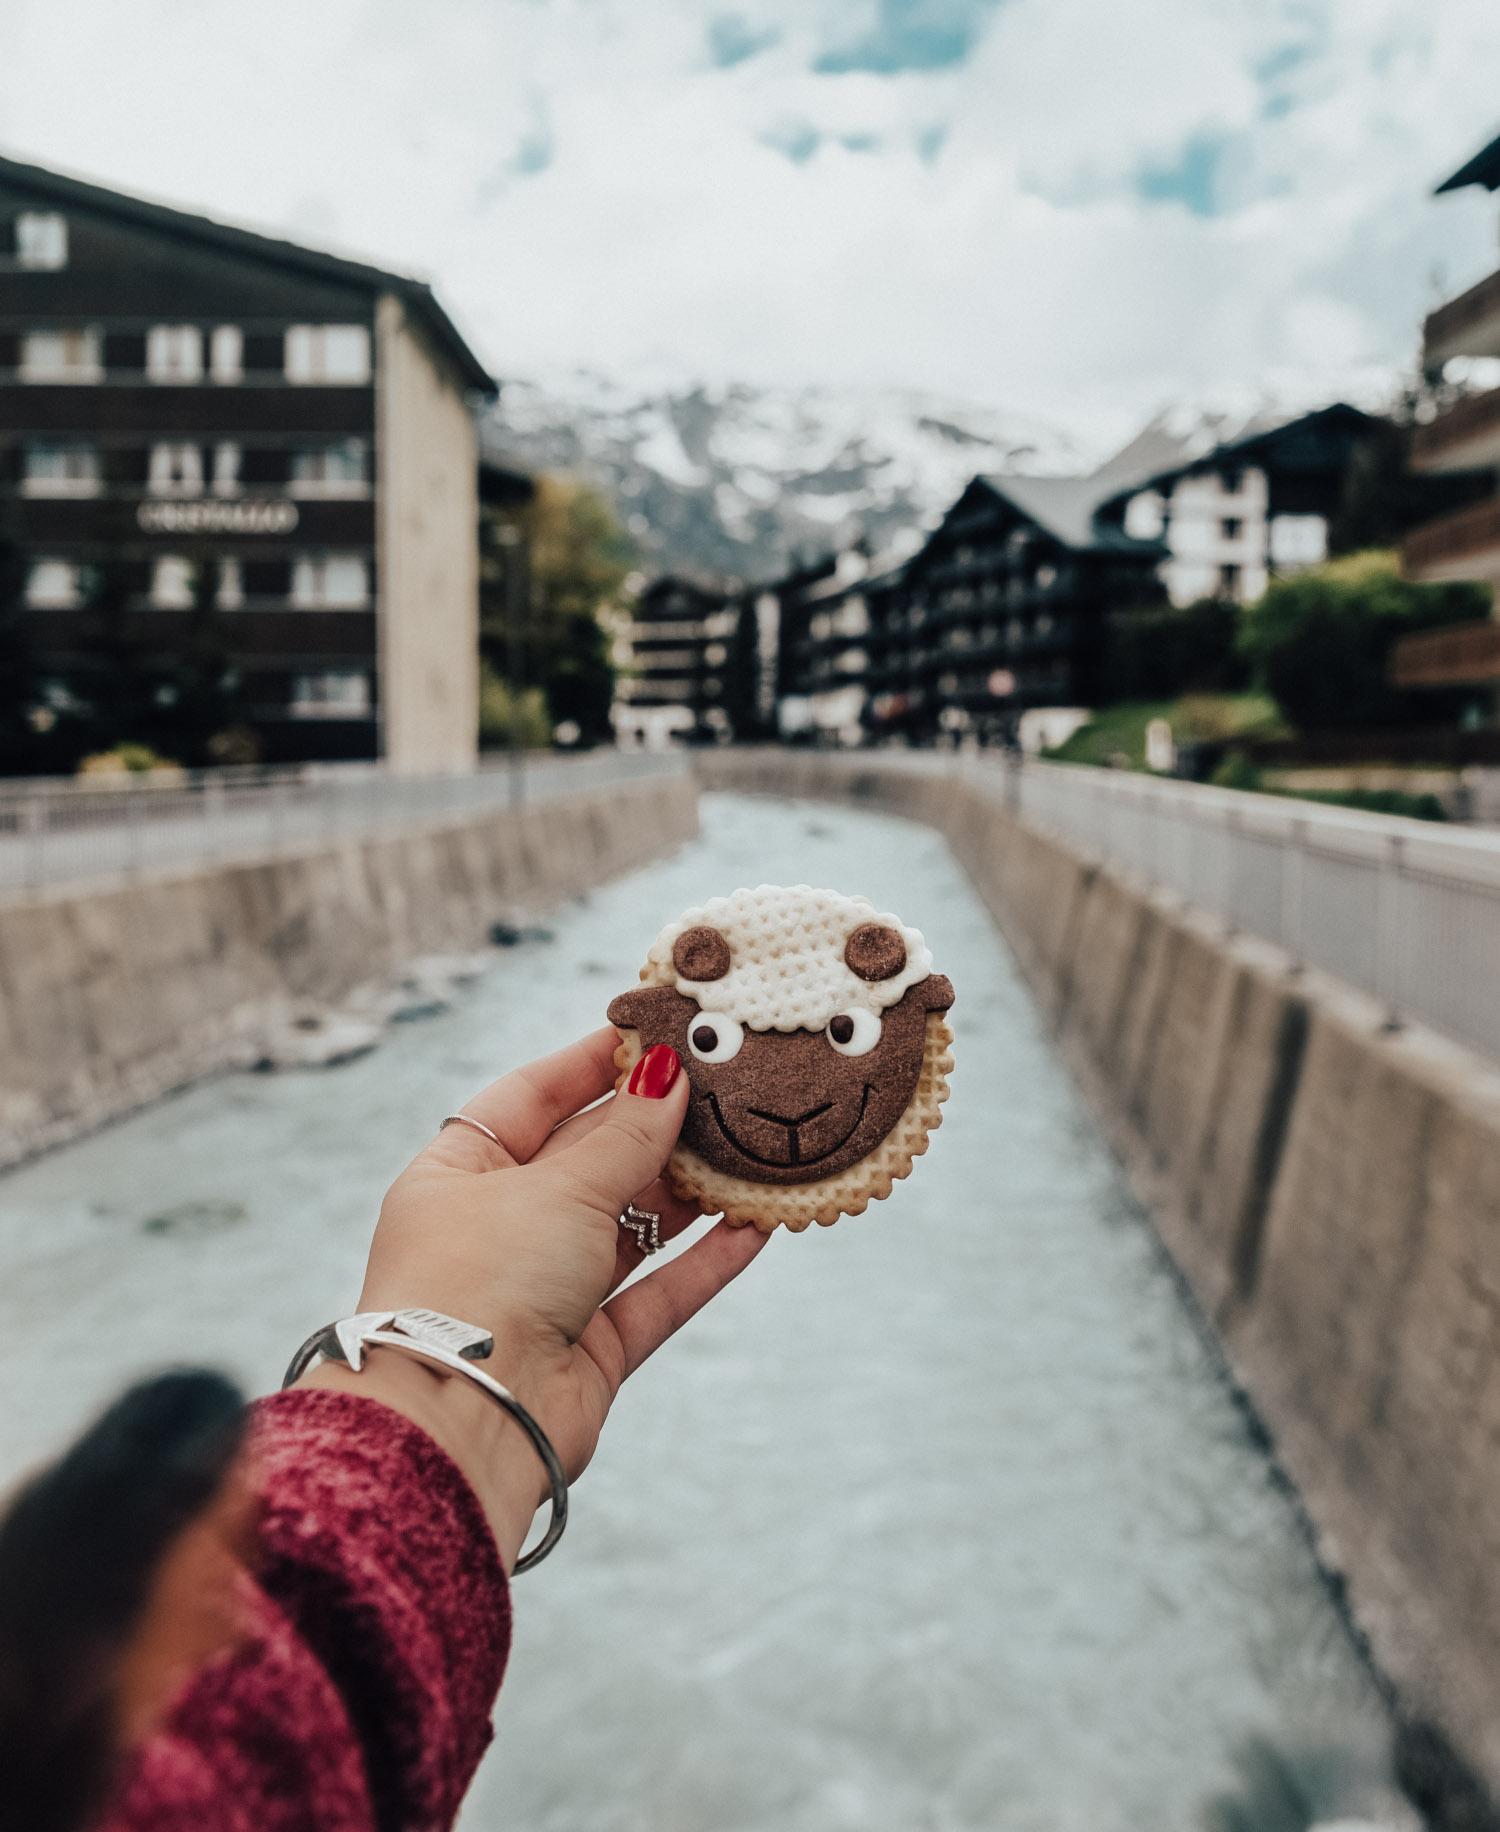 Instagramvänlig kaka i Zermatt